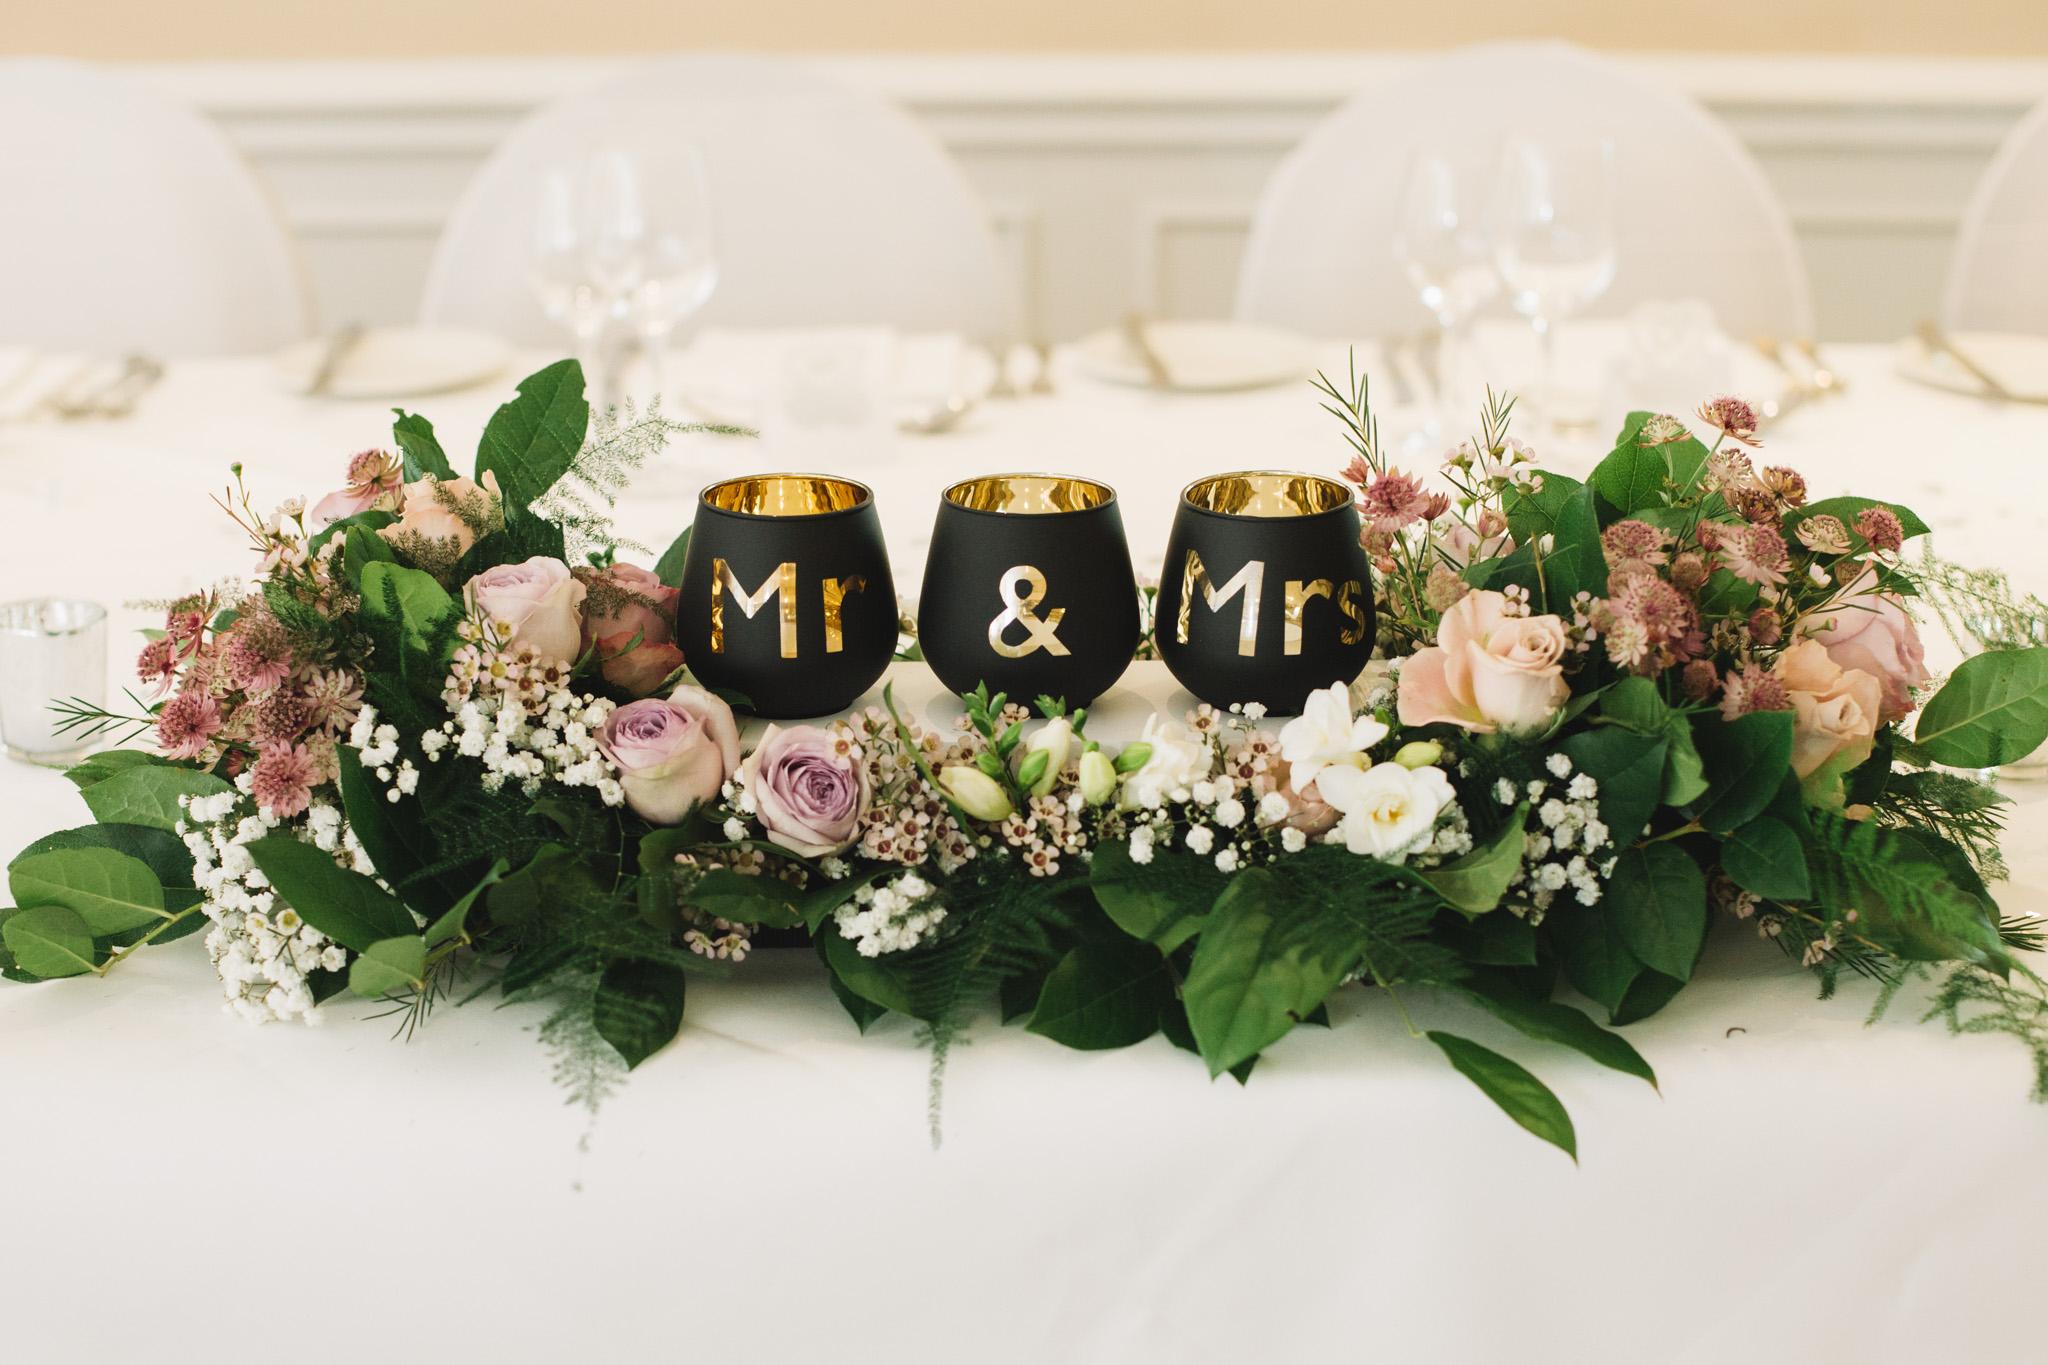 cat-lane-weddings__sheene-mill-wedding-photography__clw__1459_4G2A2420.jpg